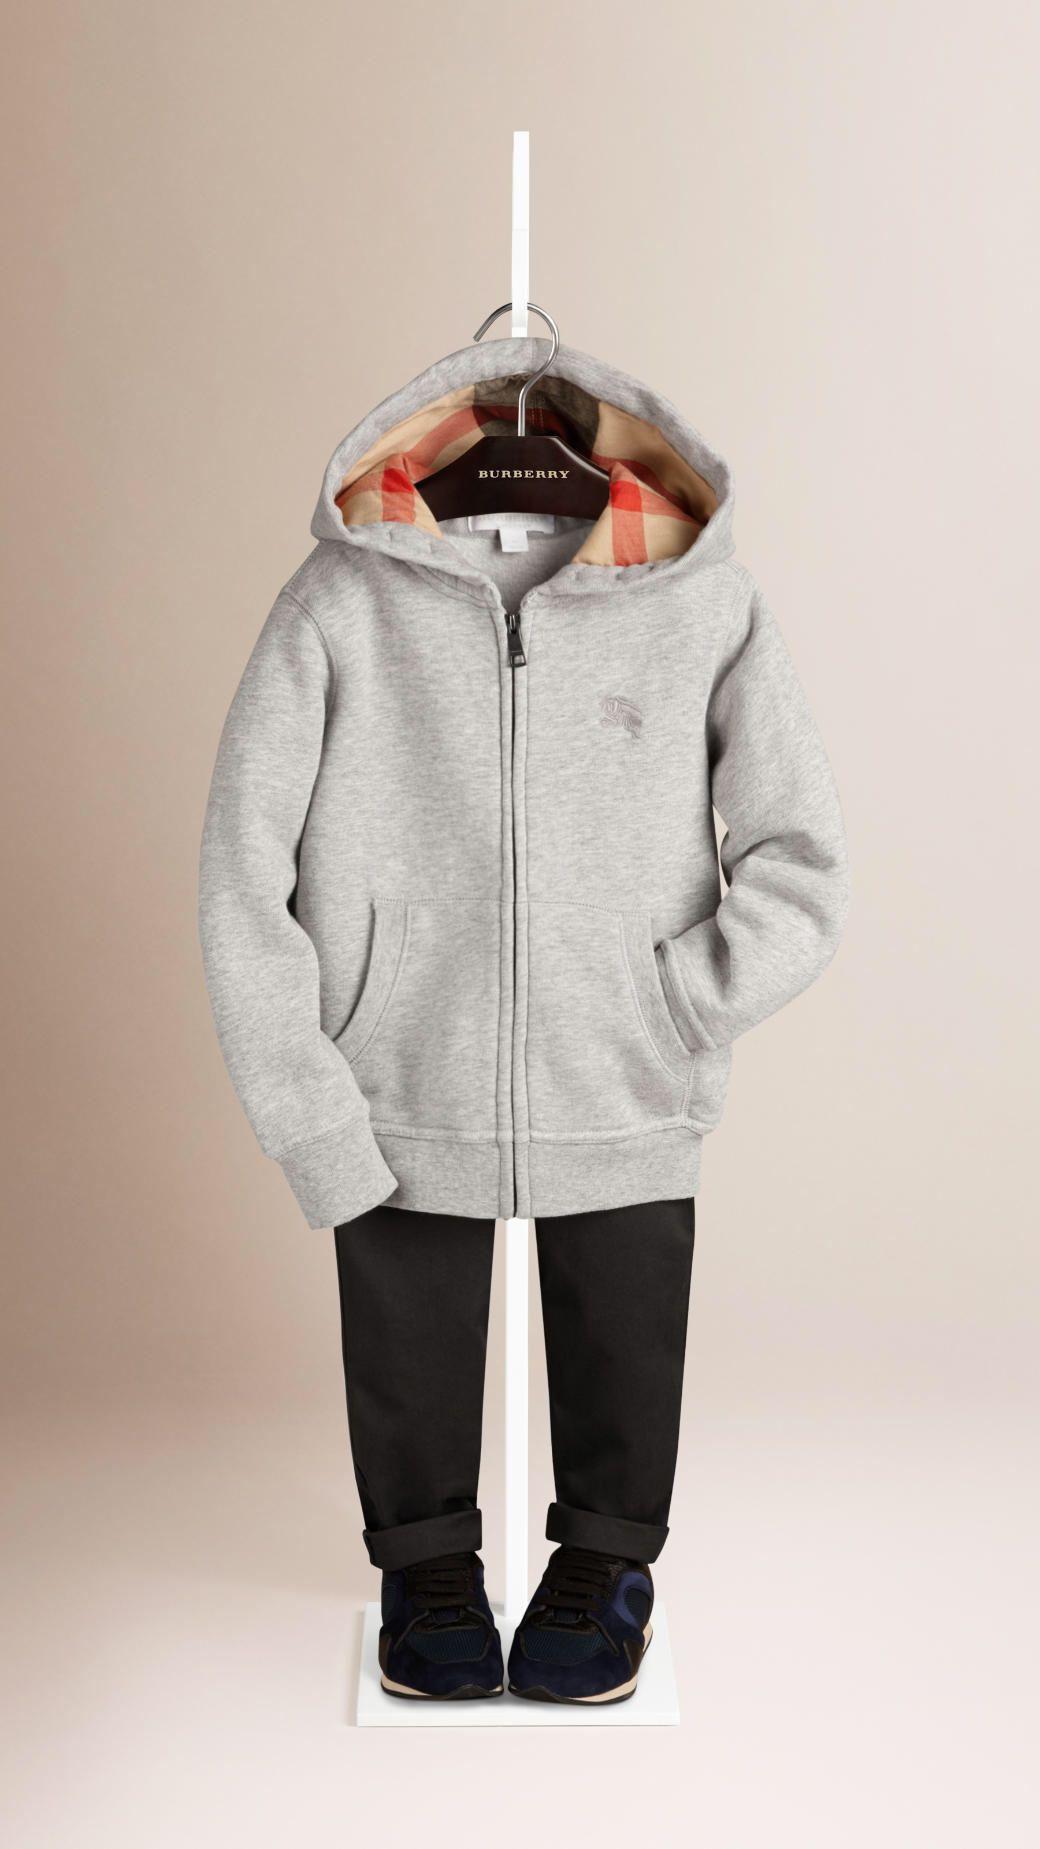 burberry hoodie kids white